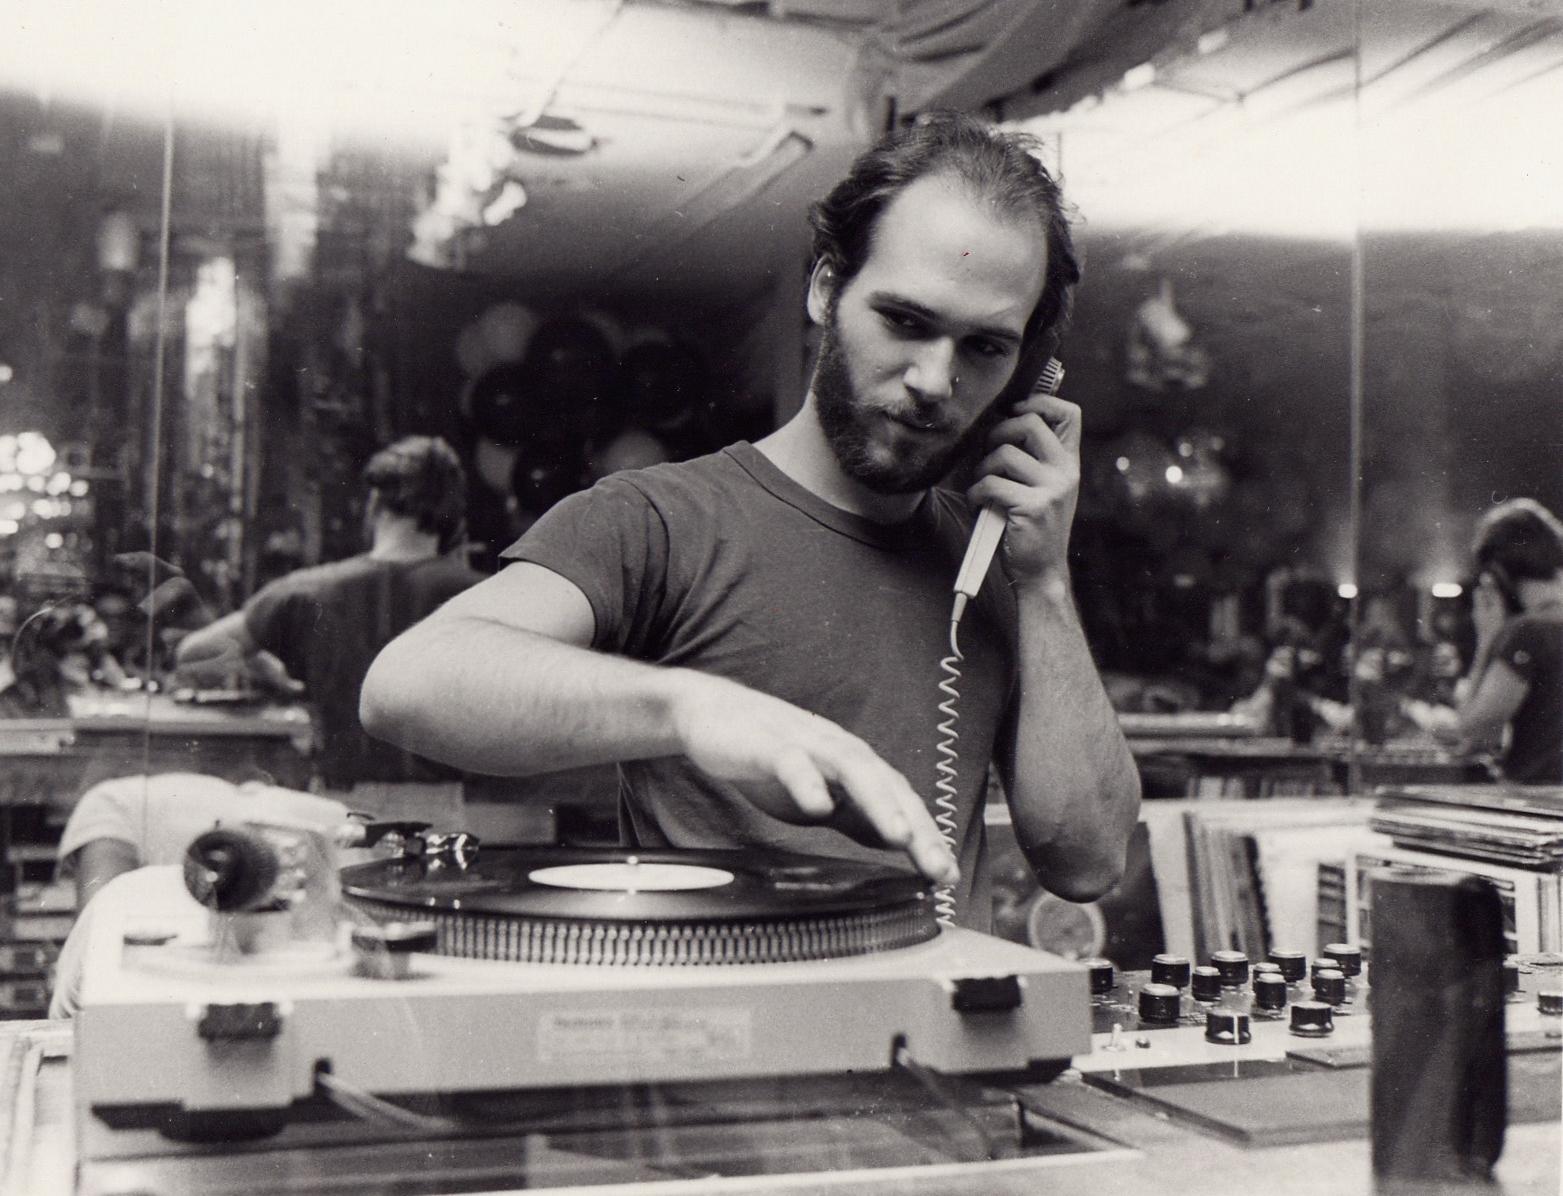 Danny Krivit 1978